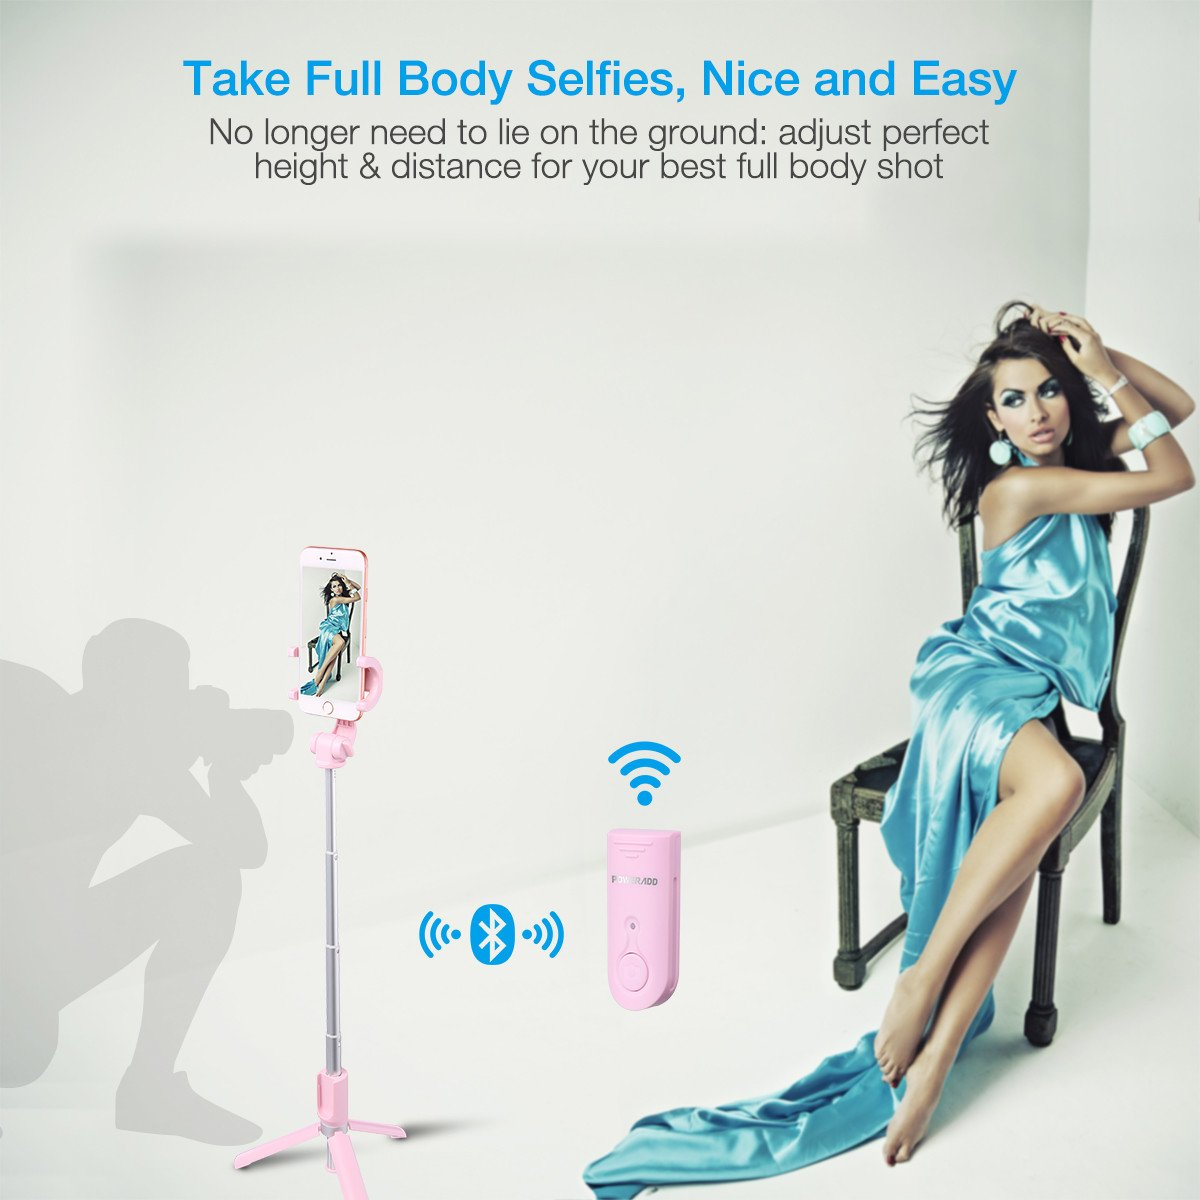 Selfie Stick Tripod,Poweradd Extendable/Foldable Aluminum Selfie Stick with Detachable/Wireless Remote for iPhone X/SE/6/6s/6 Plus/7/7 Plus/8/8 Plus/,Samsung 8/S8/S8 Plus,Nexus,LG,Moto and More-Pink by POWERADD (Image #5)